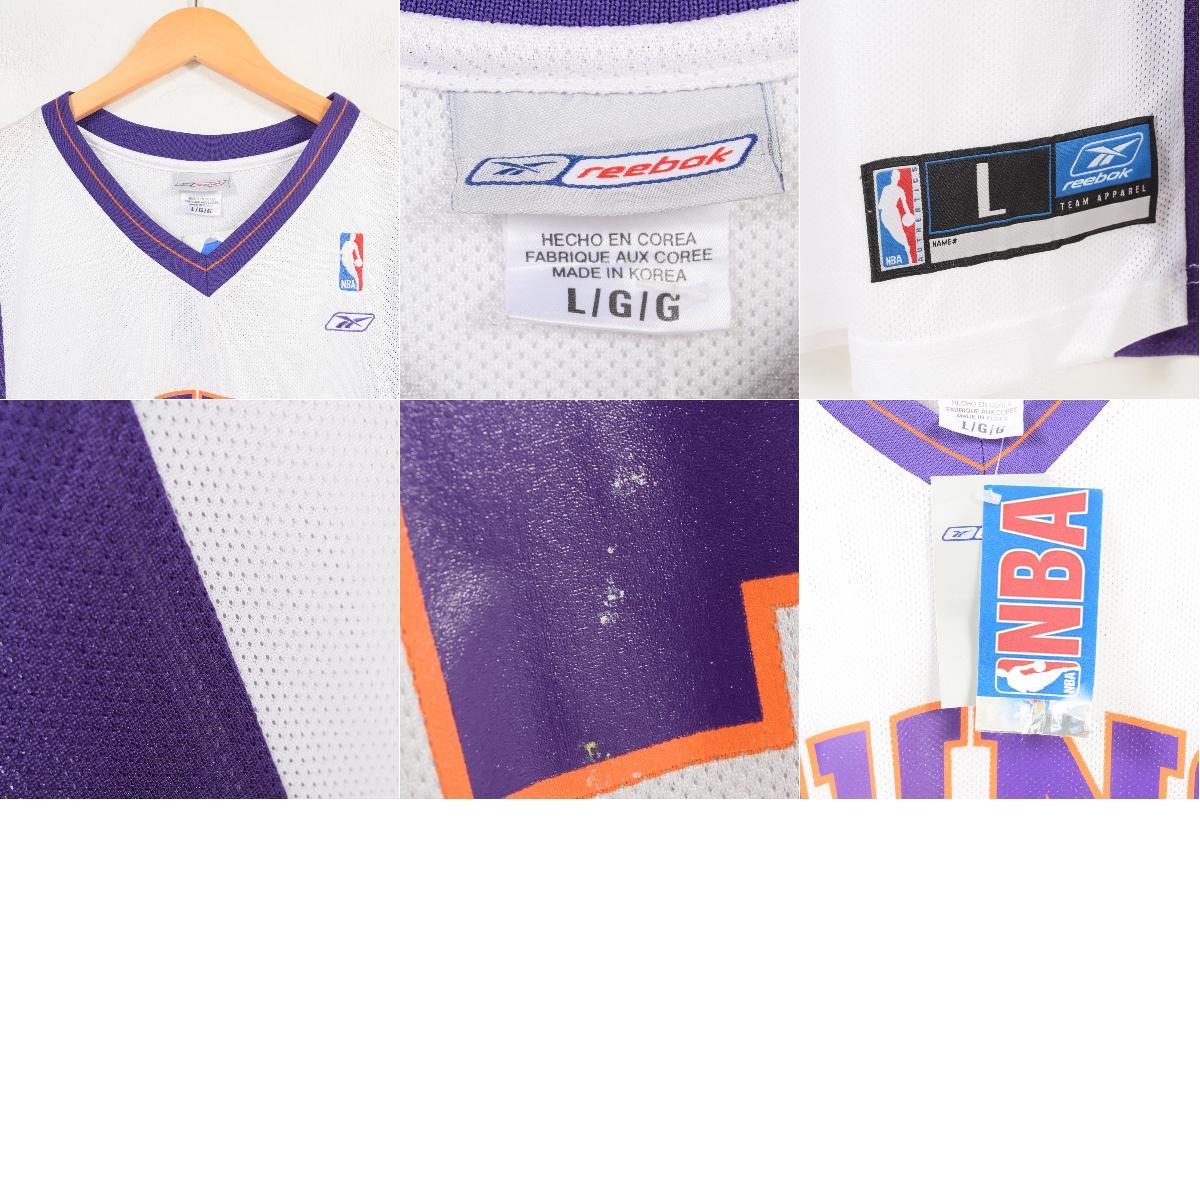 e6321ce8b5df DEADSTOCK dead stock Reebok Reebok NBA PHOENIX SUNS Phoenix Suns STEPHON  MARBURY Stephon Marbury game shirt replica uniform men XL  wap0663